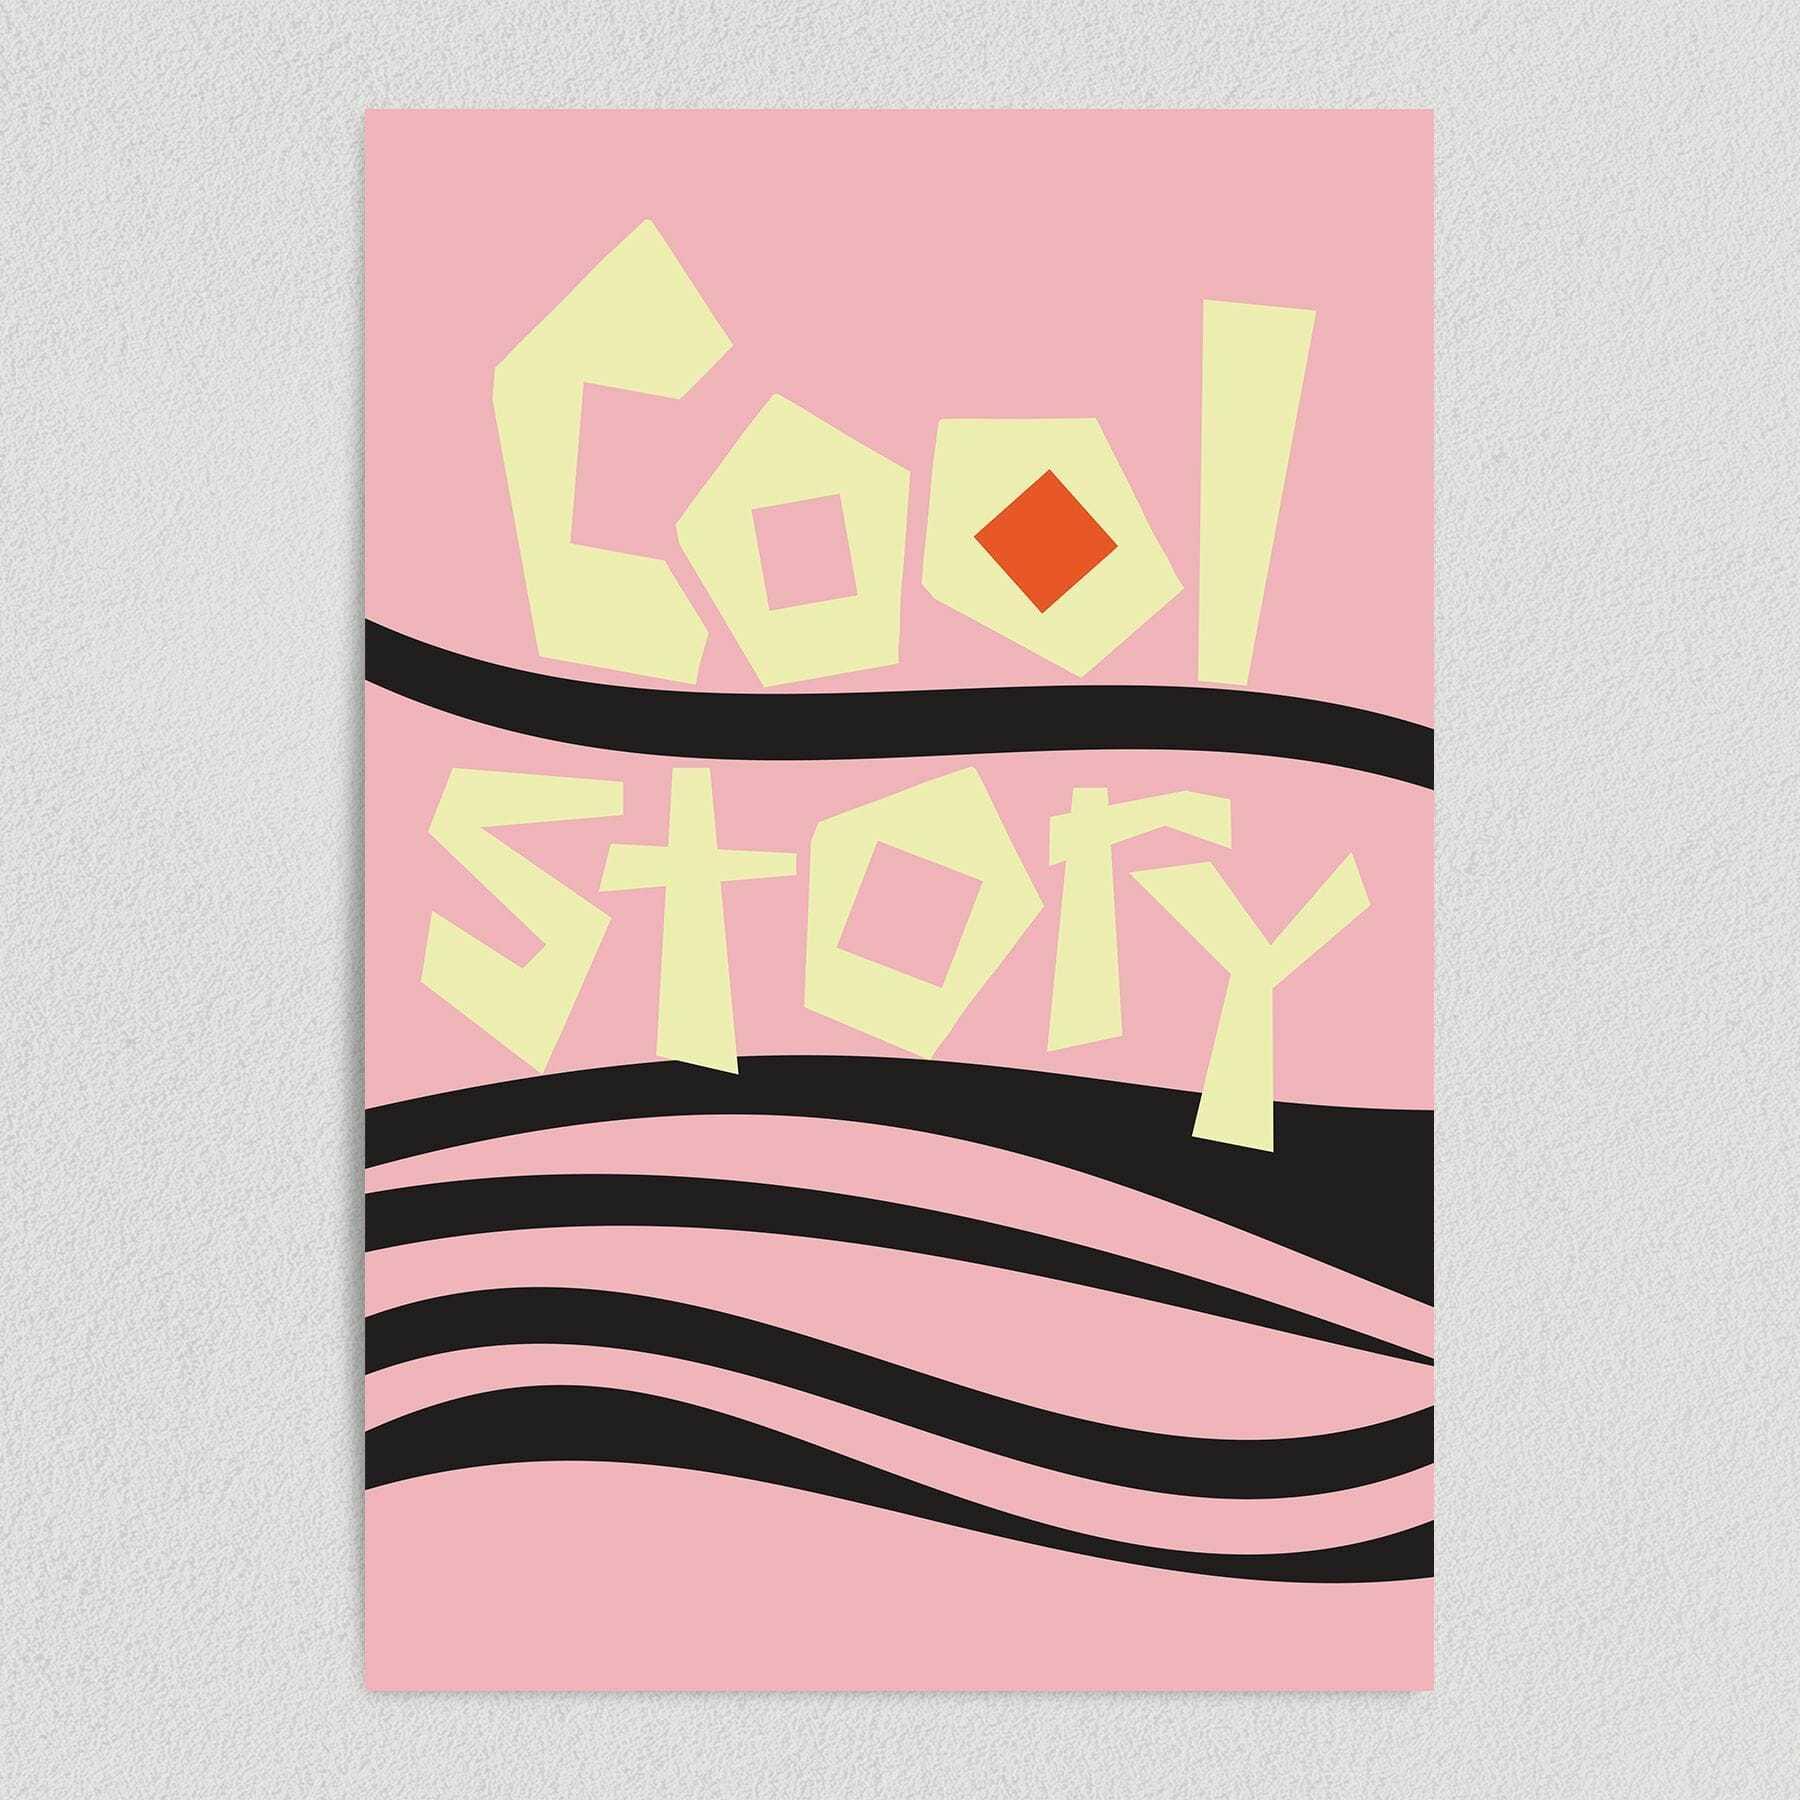 Cool Story Retro College Humor Art Print Poster 12″ x 18″ Wall Art FQ1010